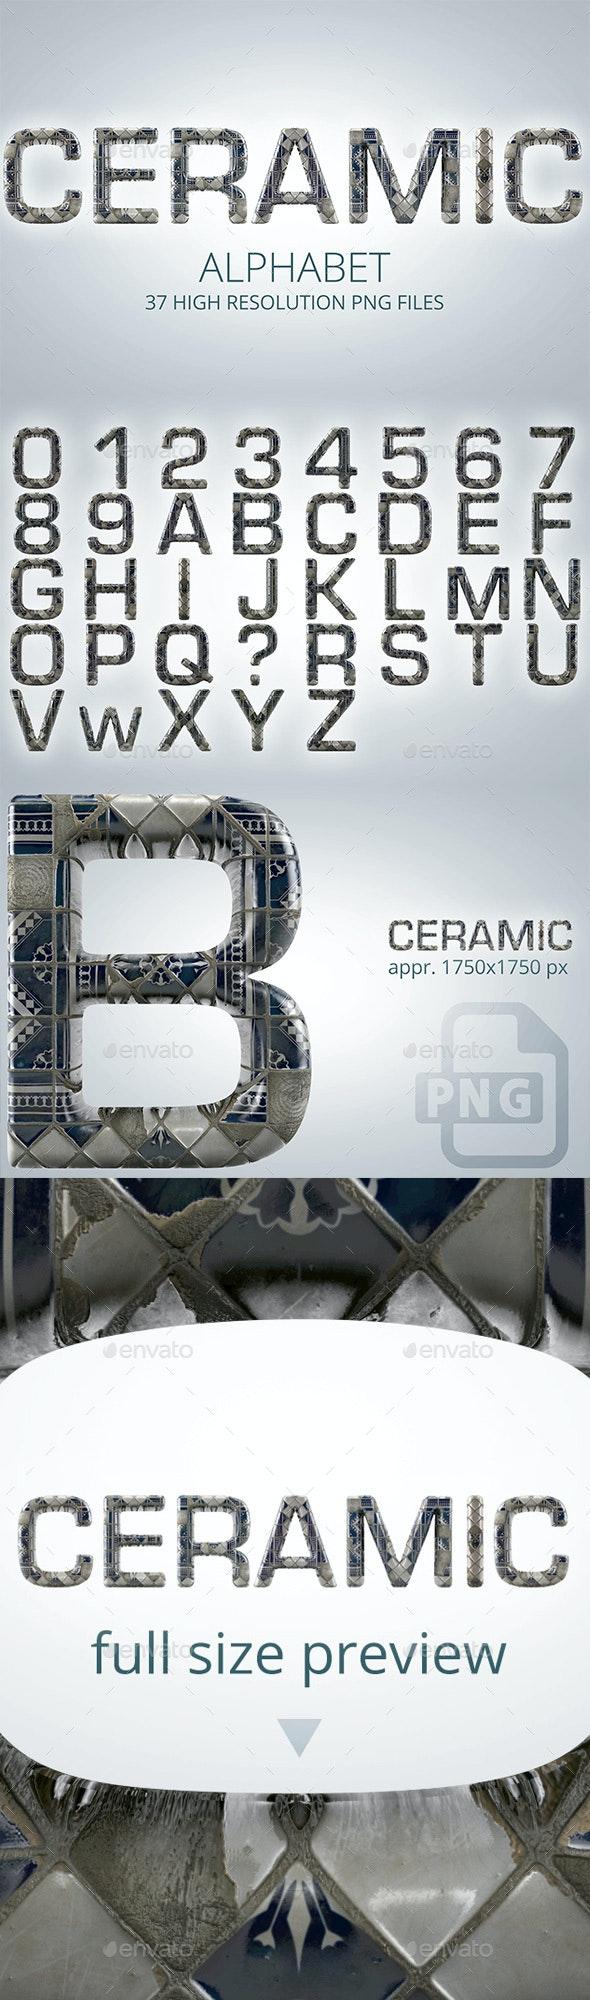 3D Render Set of a Ceramic Alphabet - Text 3D Renders